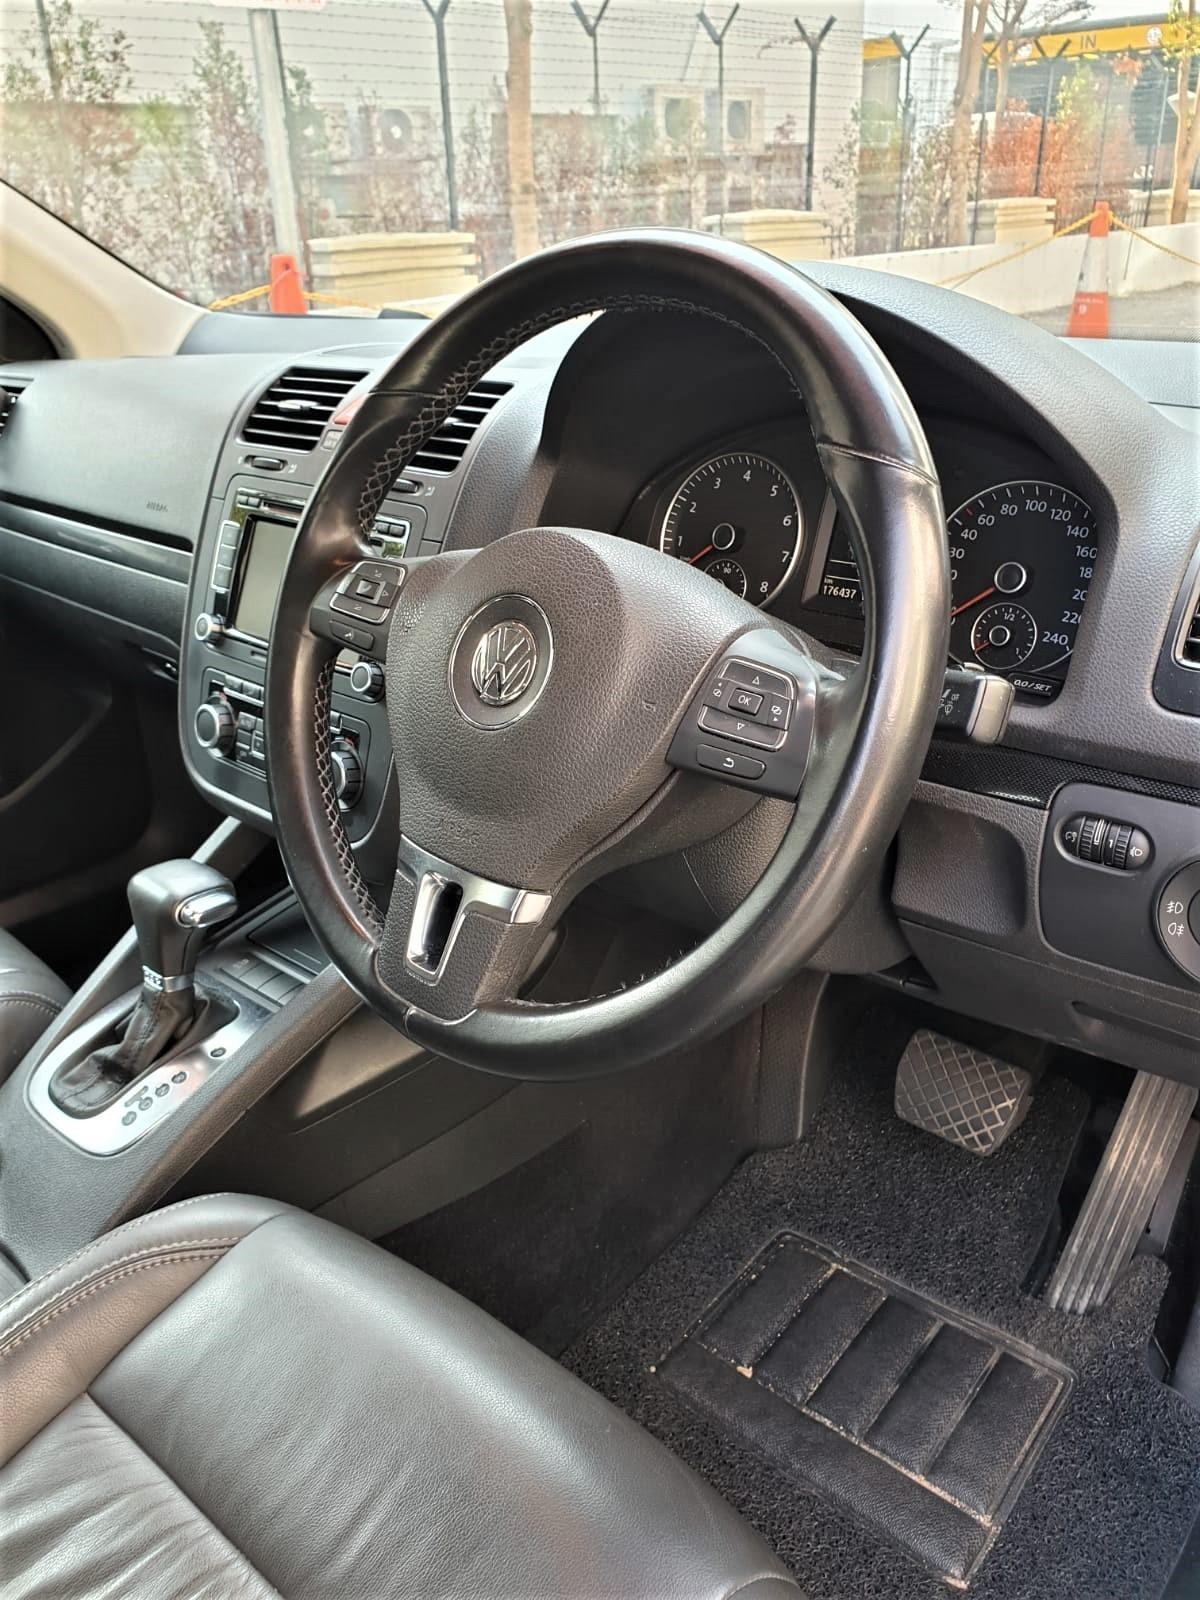 Volkswagen Jetta *Best rates, full servicing provided!